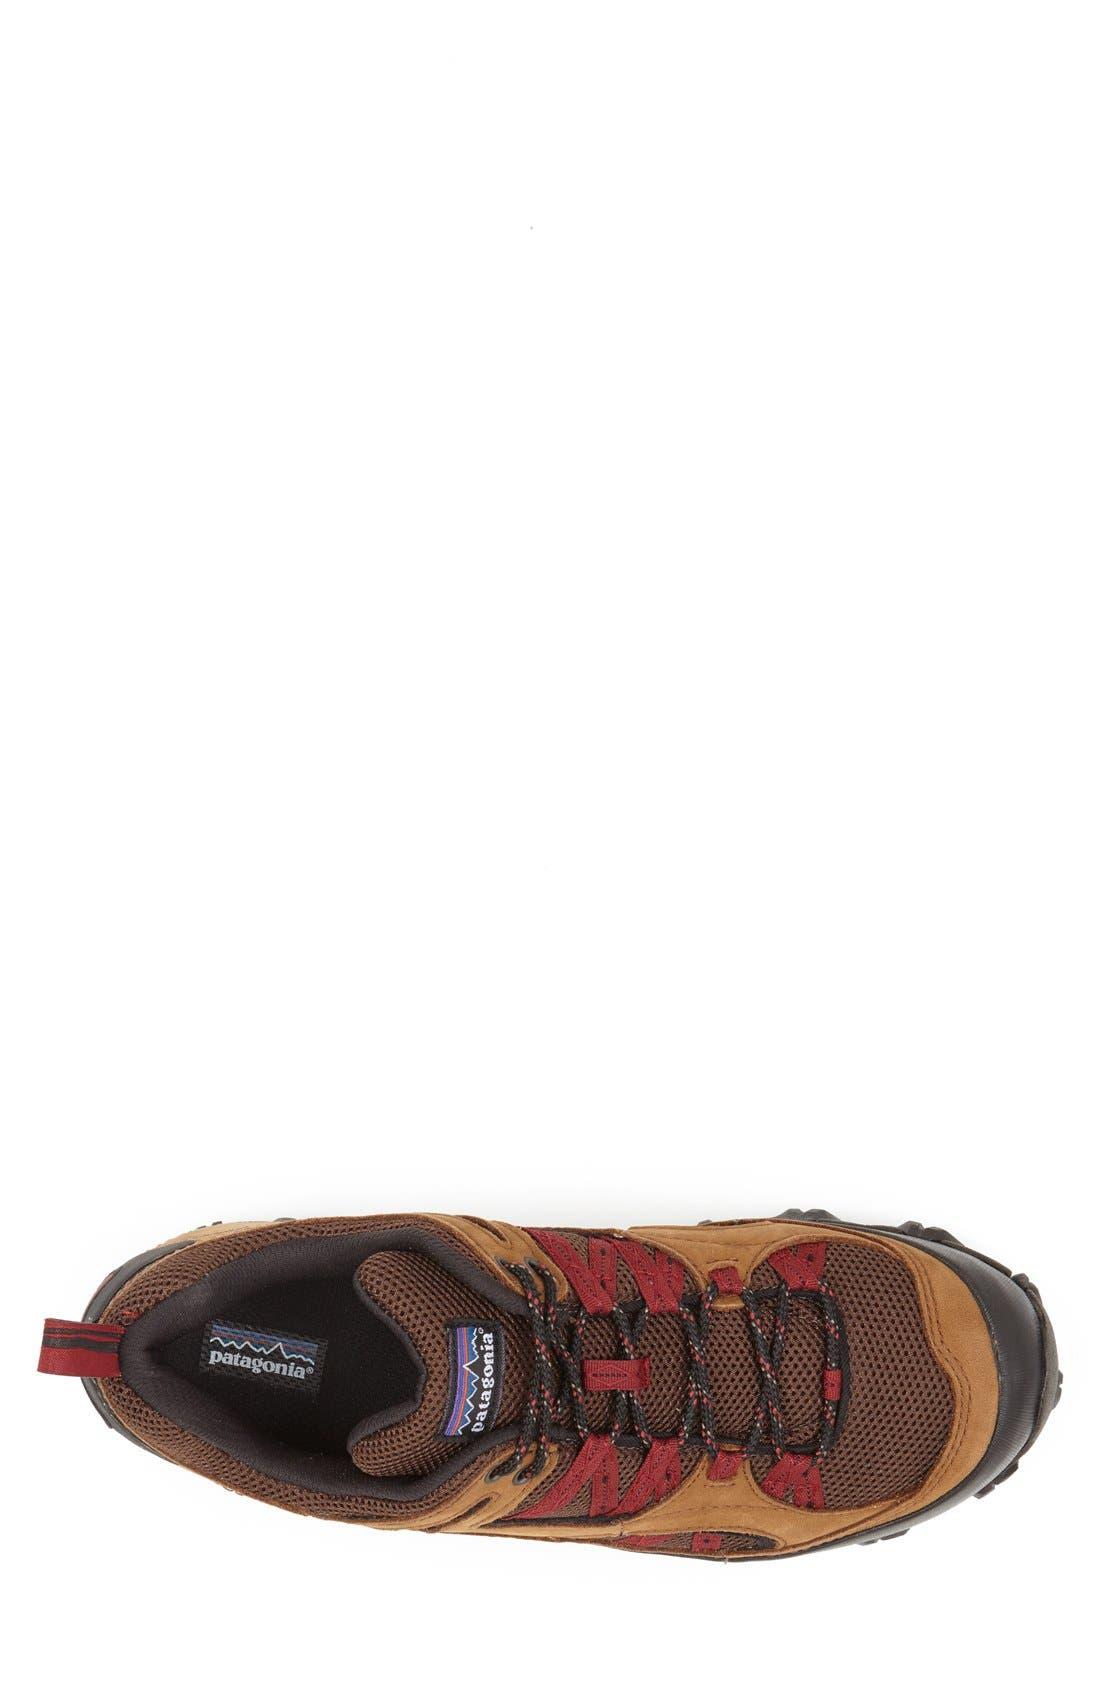 Alternate Image 3  - Patagonia 'Drifter A/C' Trail Shoe (Men)